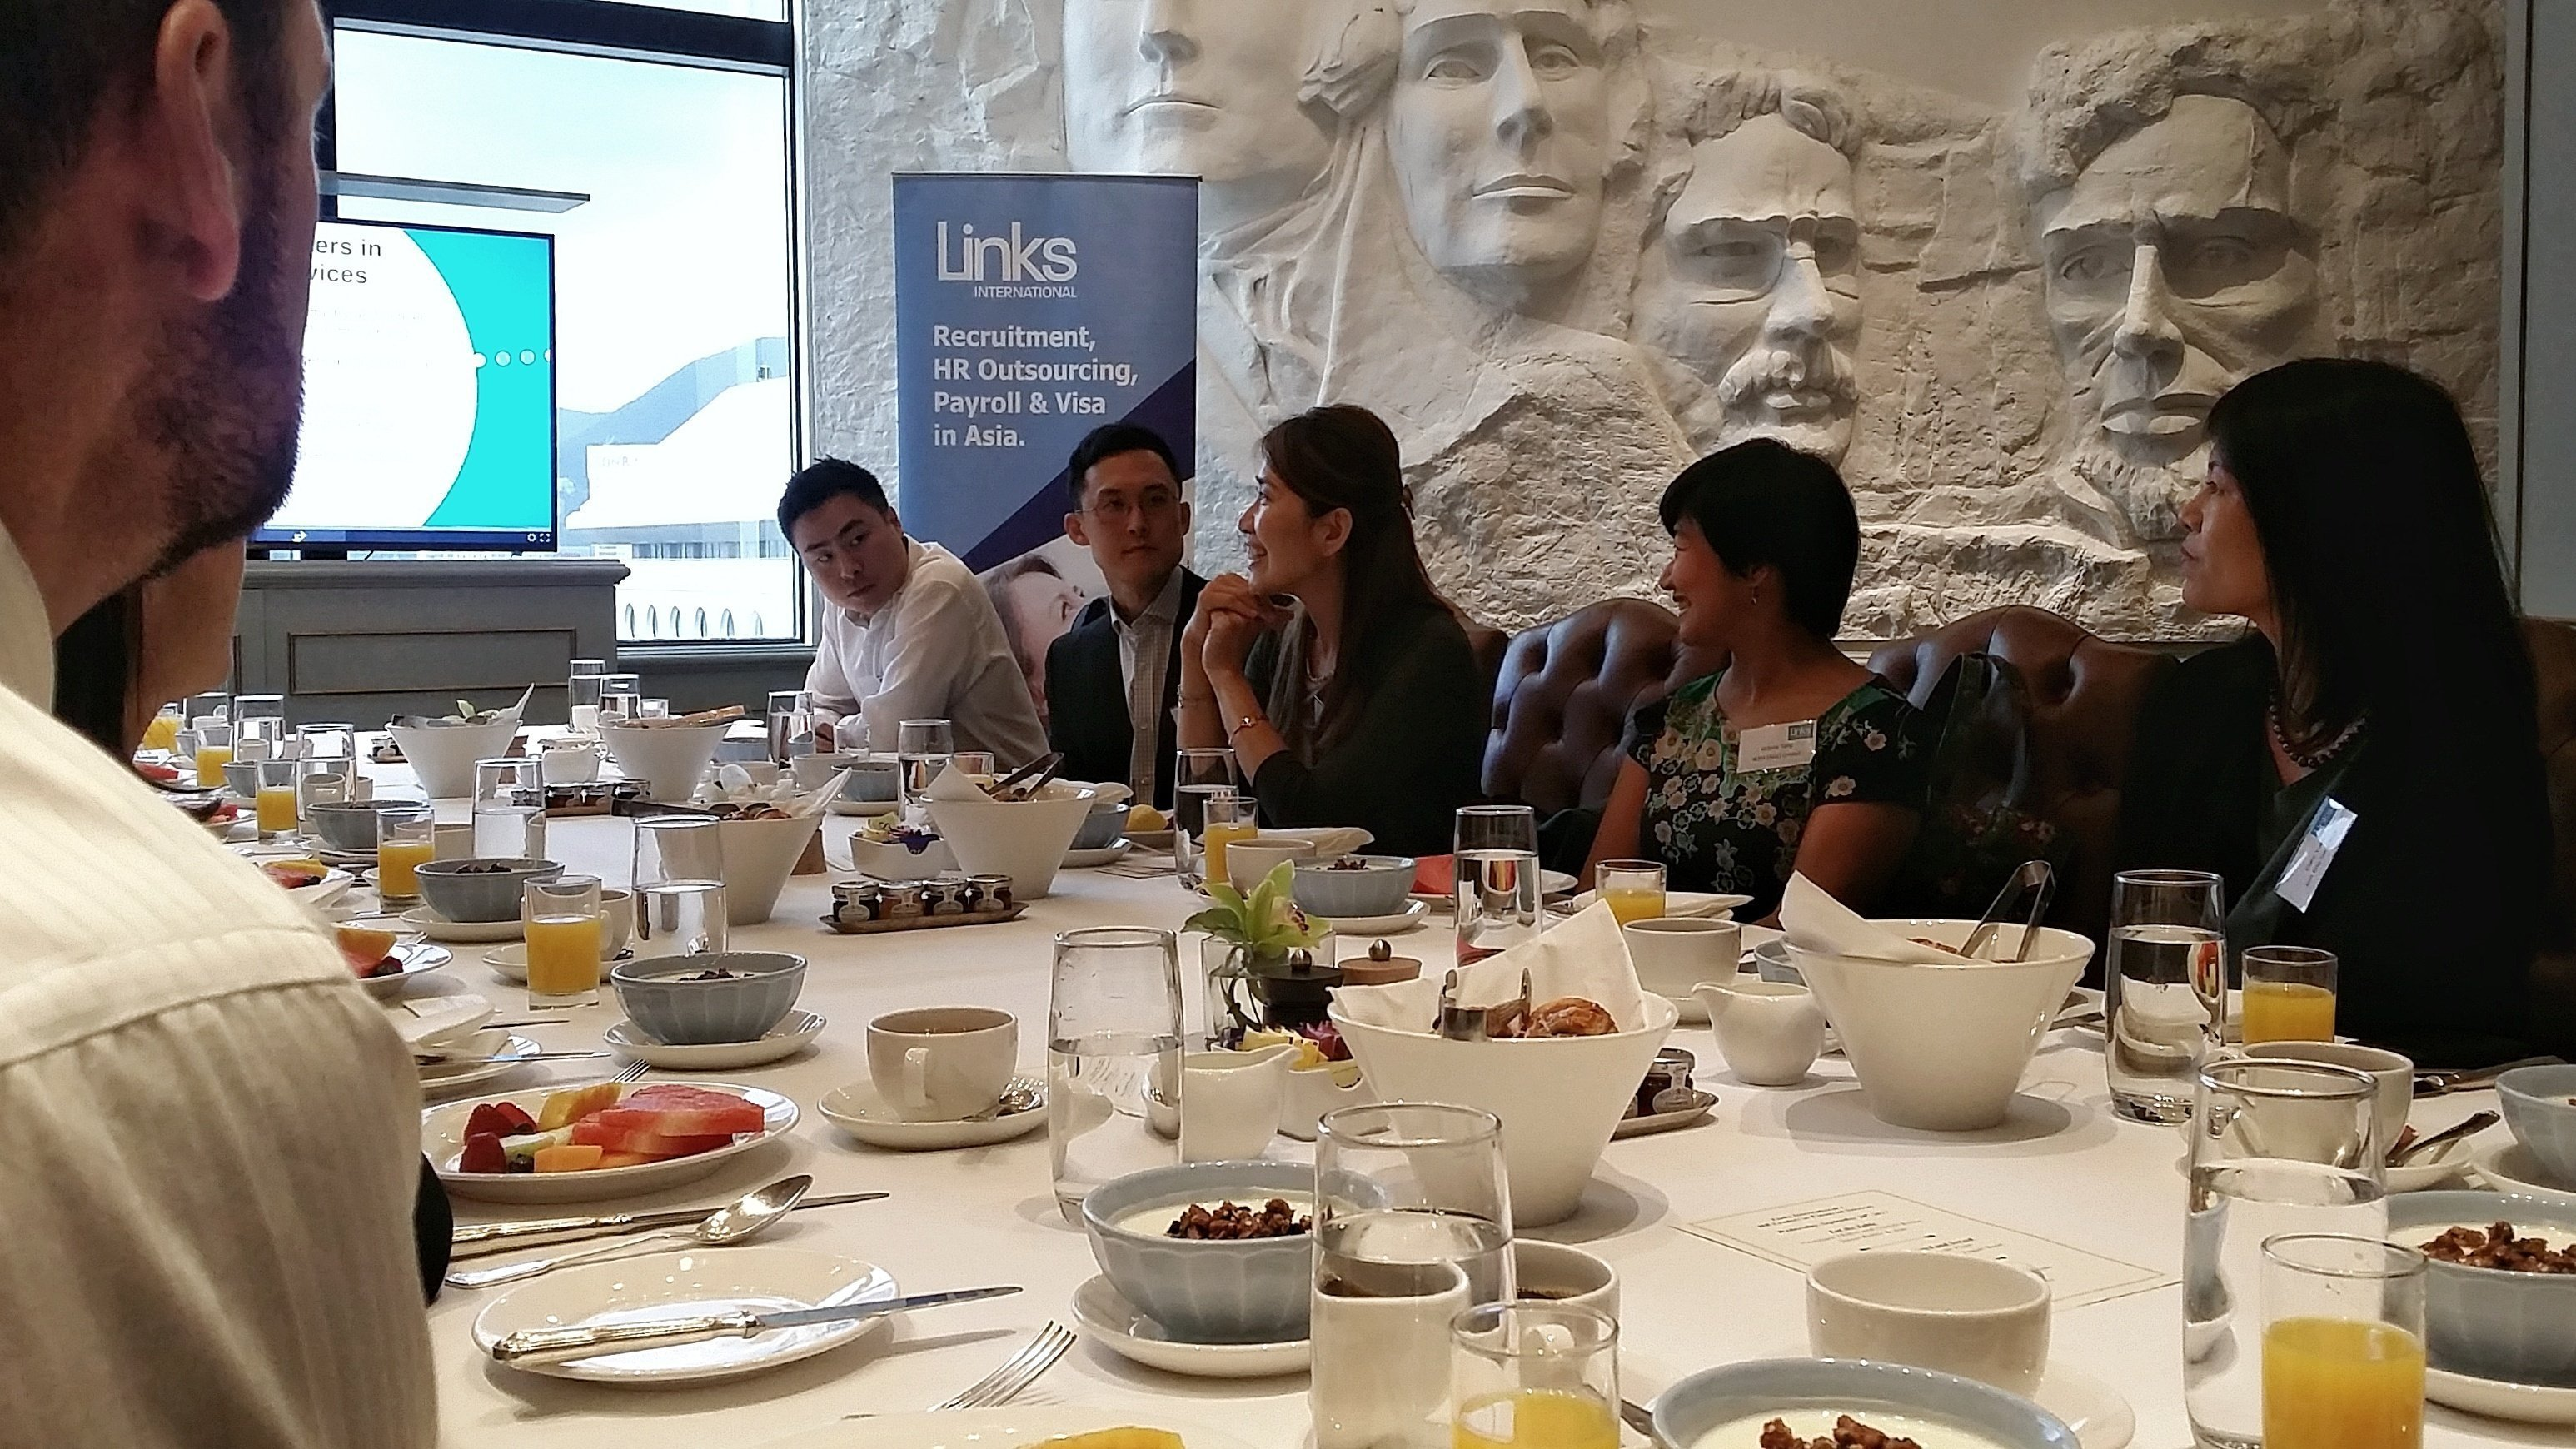 HR_Leaders_Financial_Services_Discuss_Analytics_01.jpeg